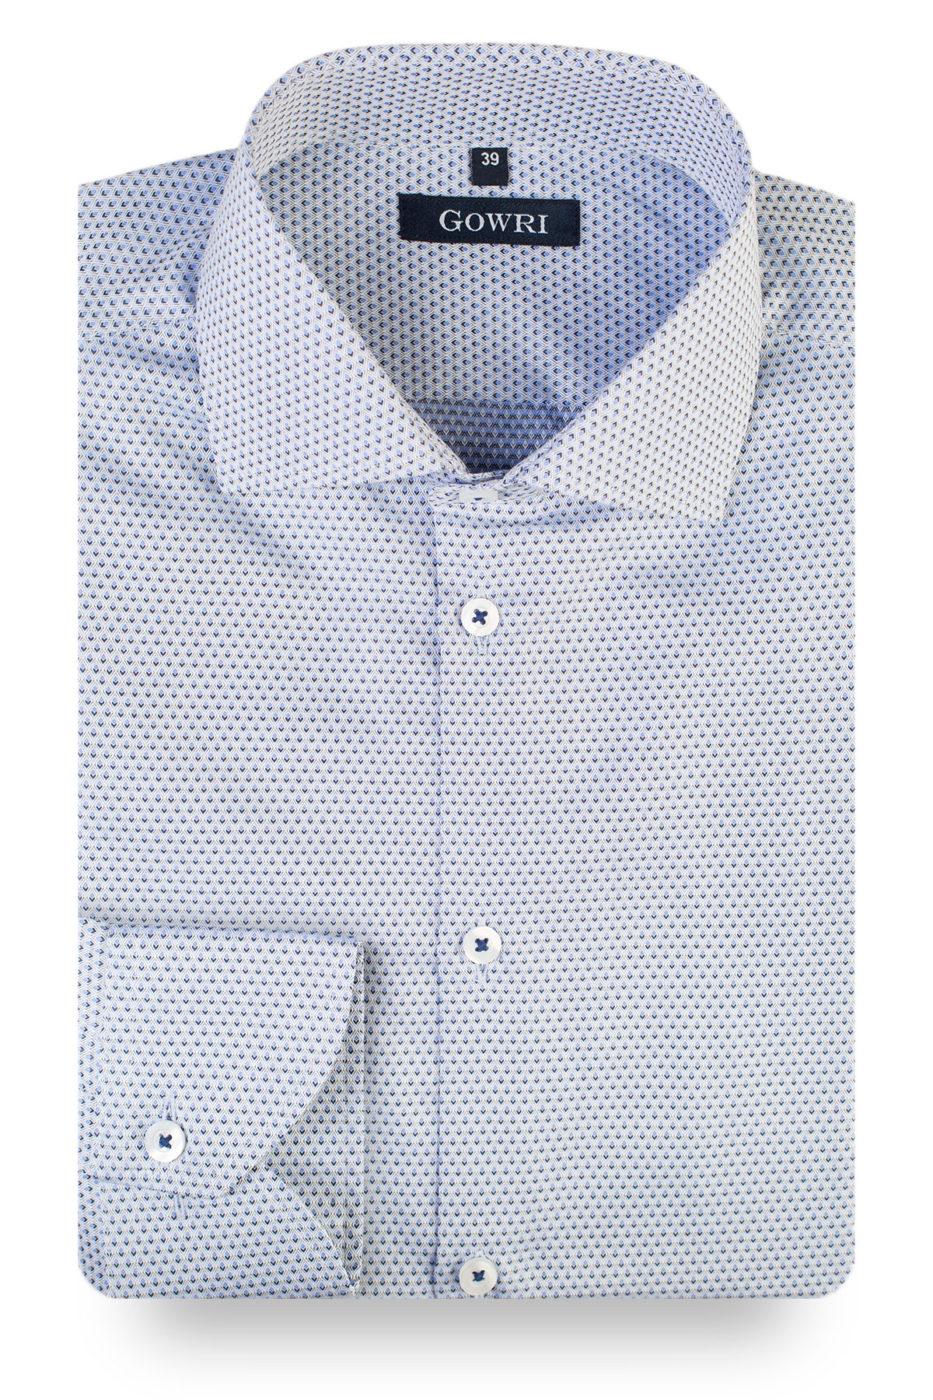 Fokus Grey Patterned Shirt (1)